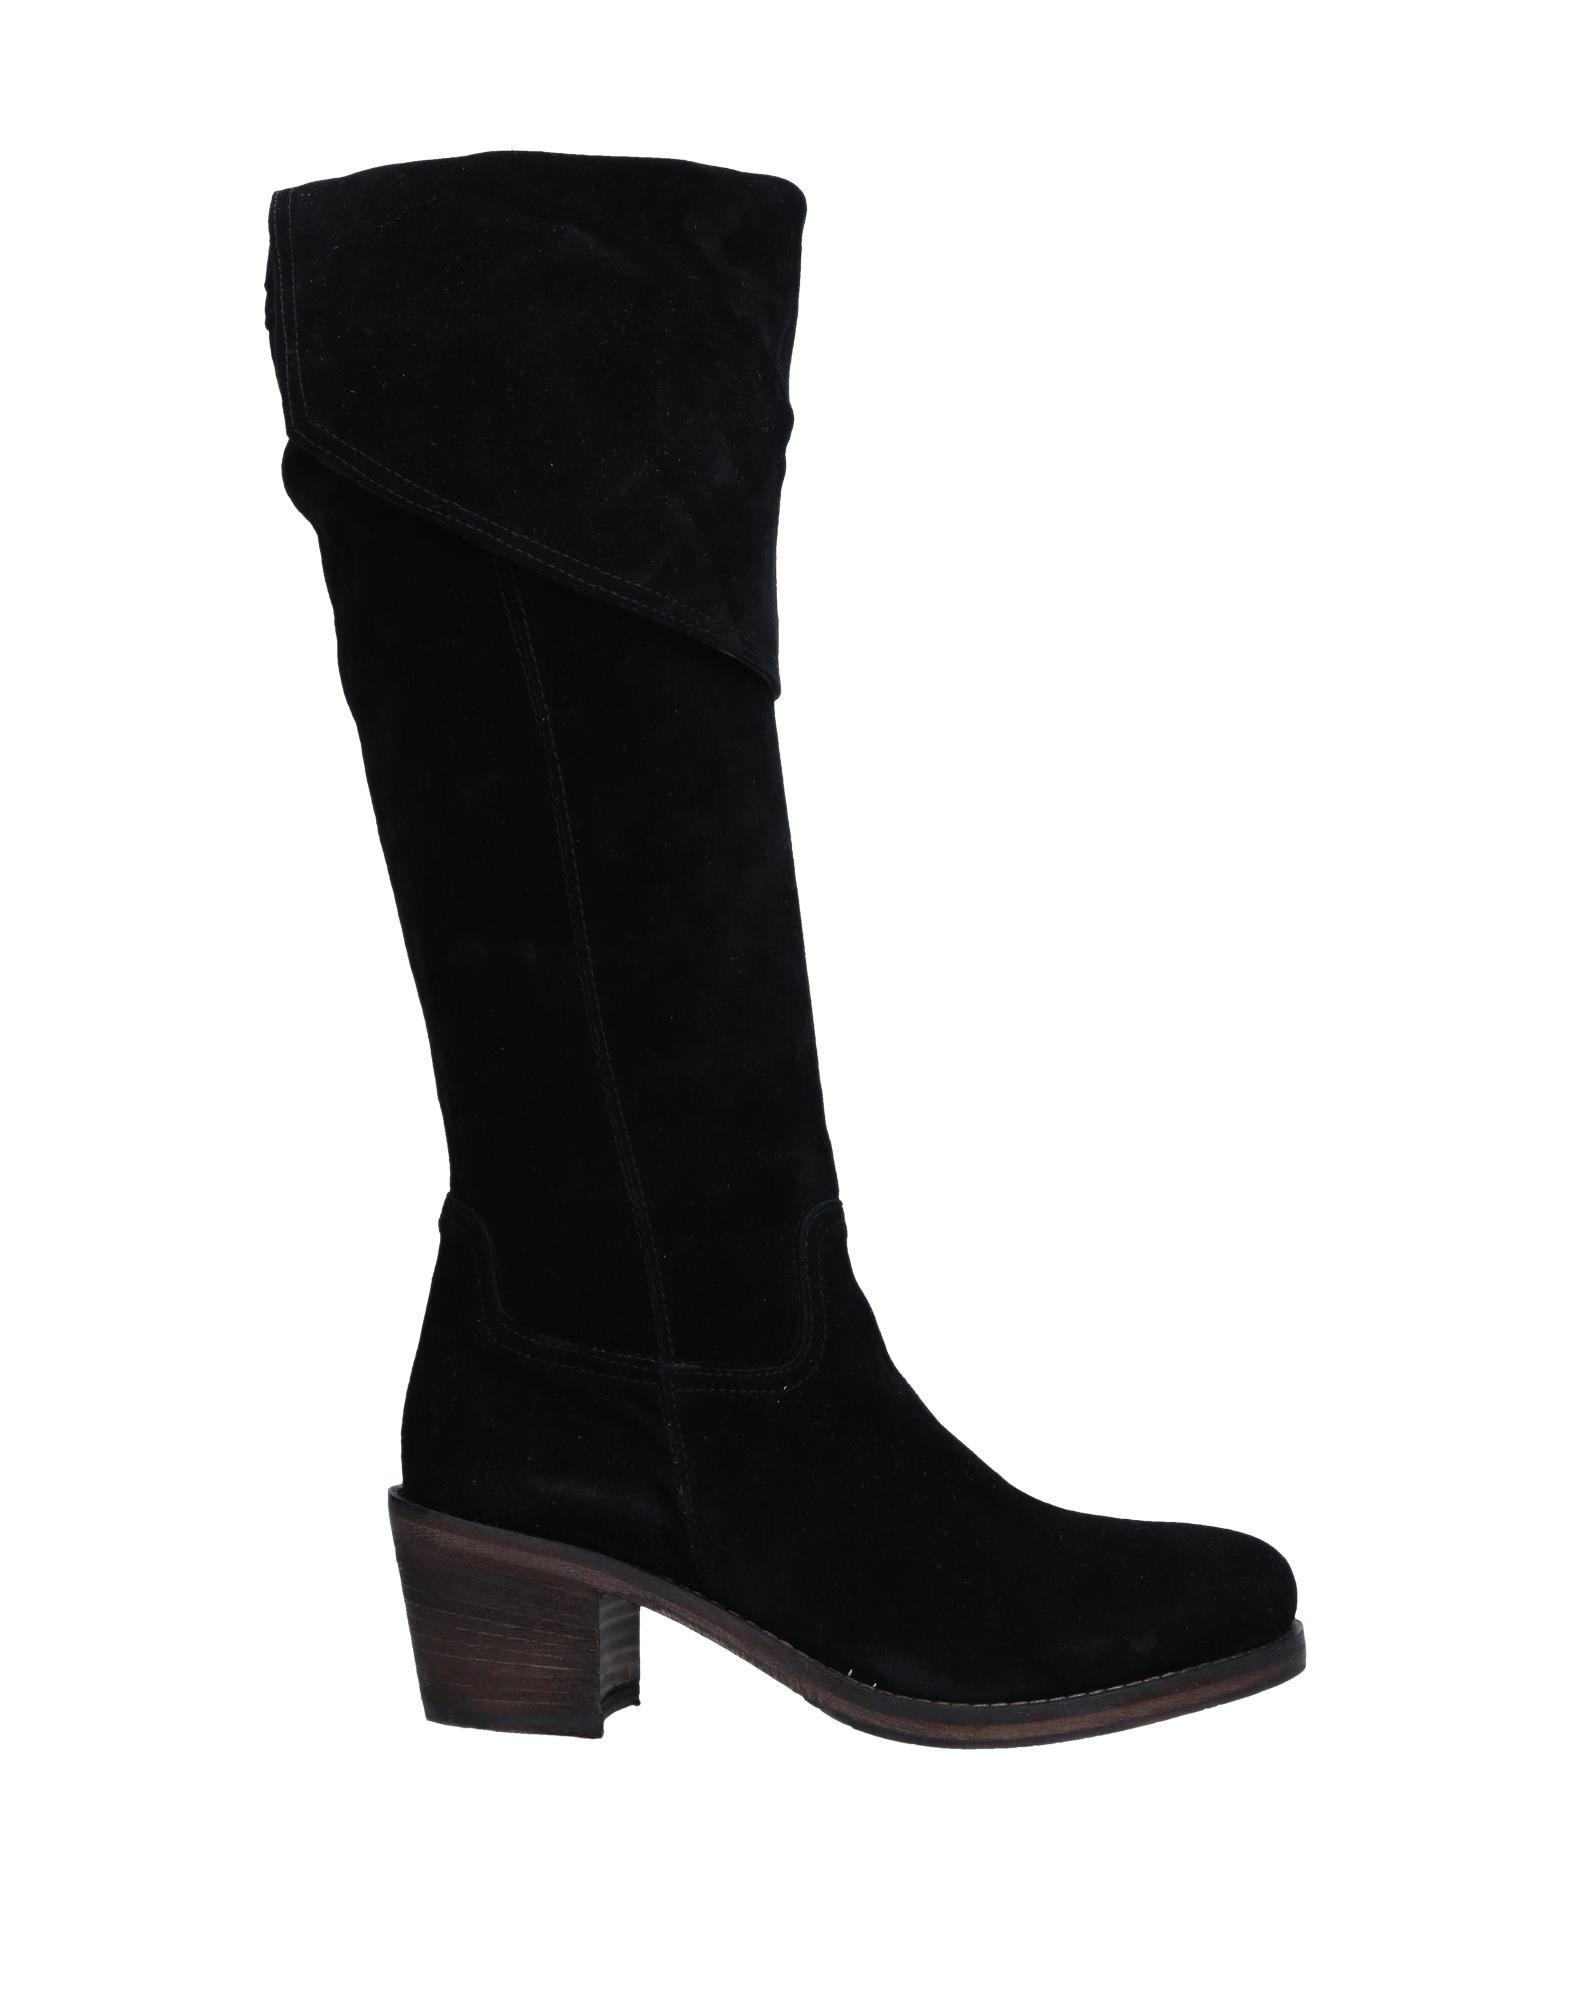 El Campero Boots Boots - Women El Campero Boots Boots online on  United Kingdom - 11544312WF 02d88d